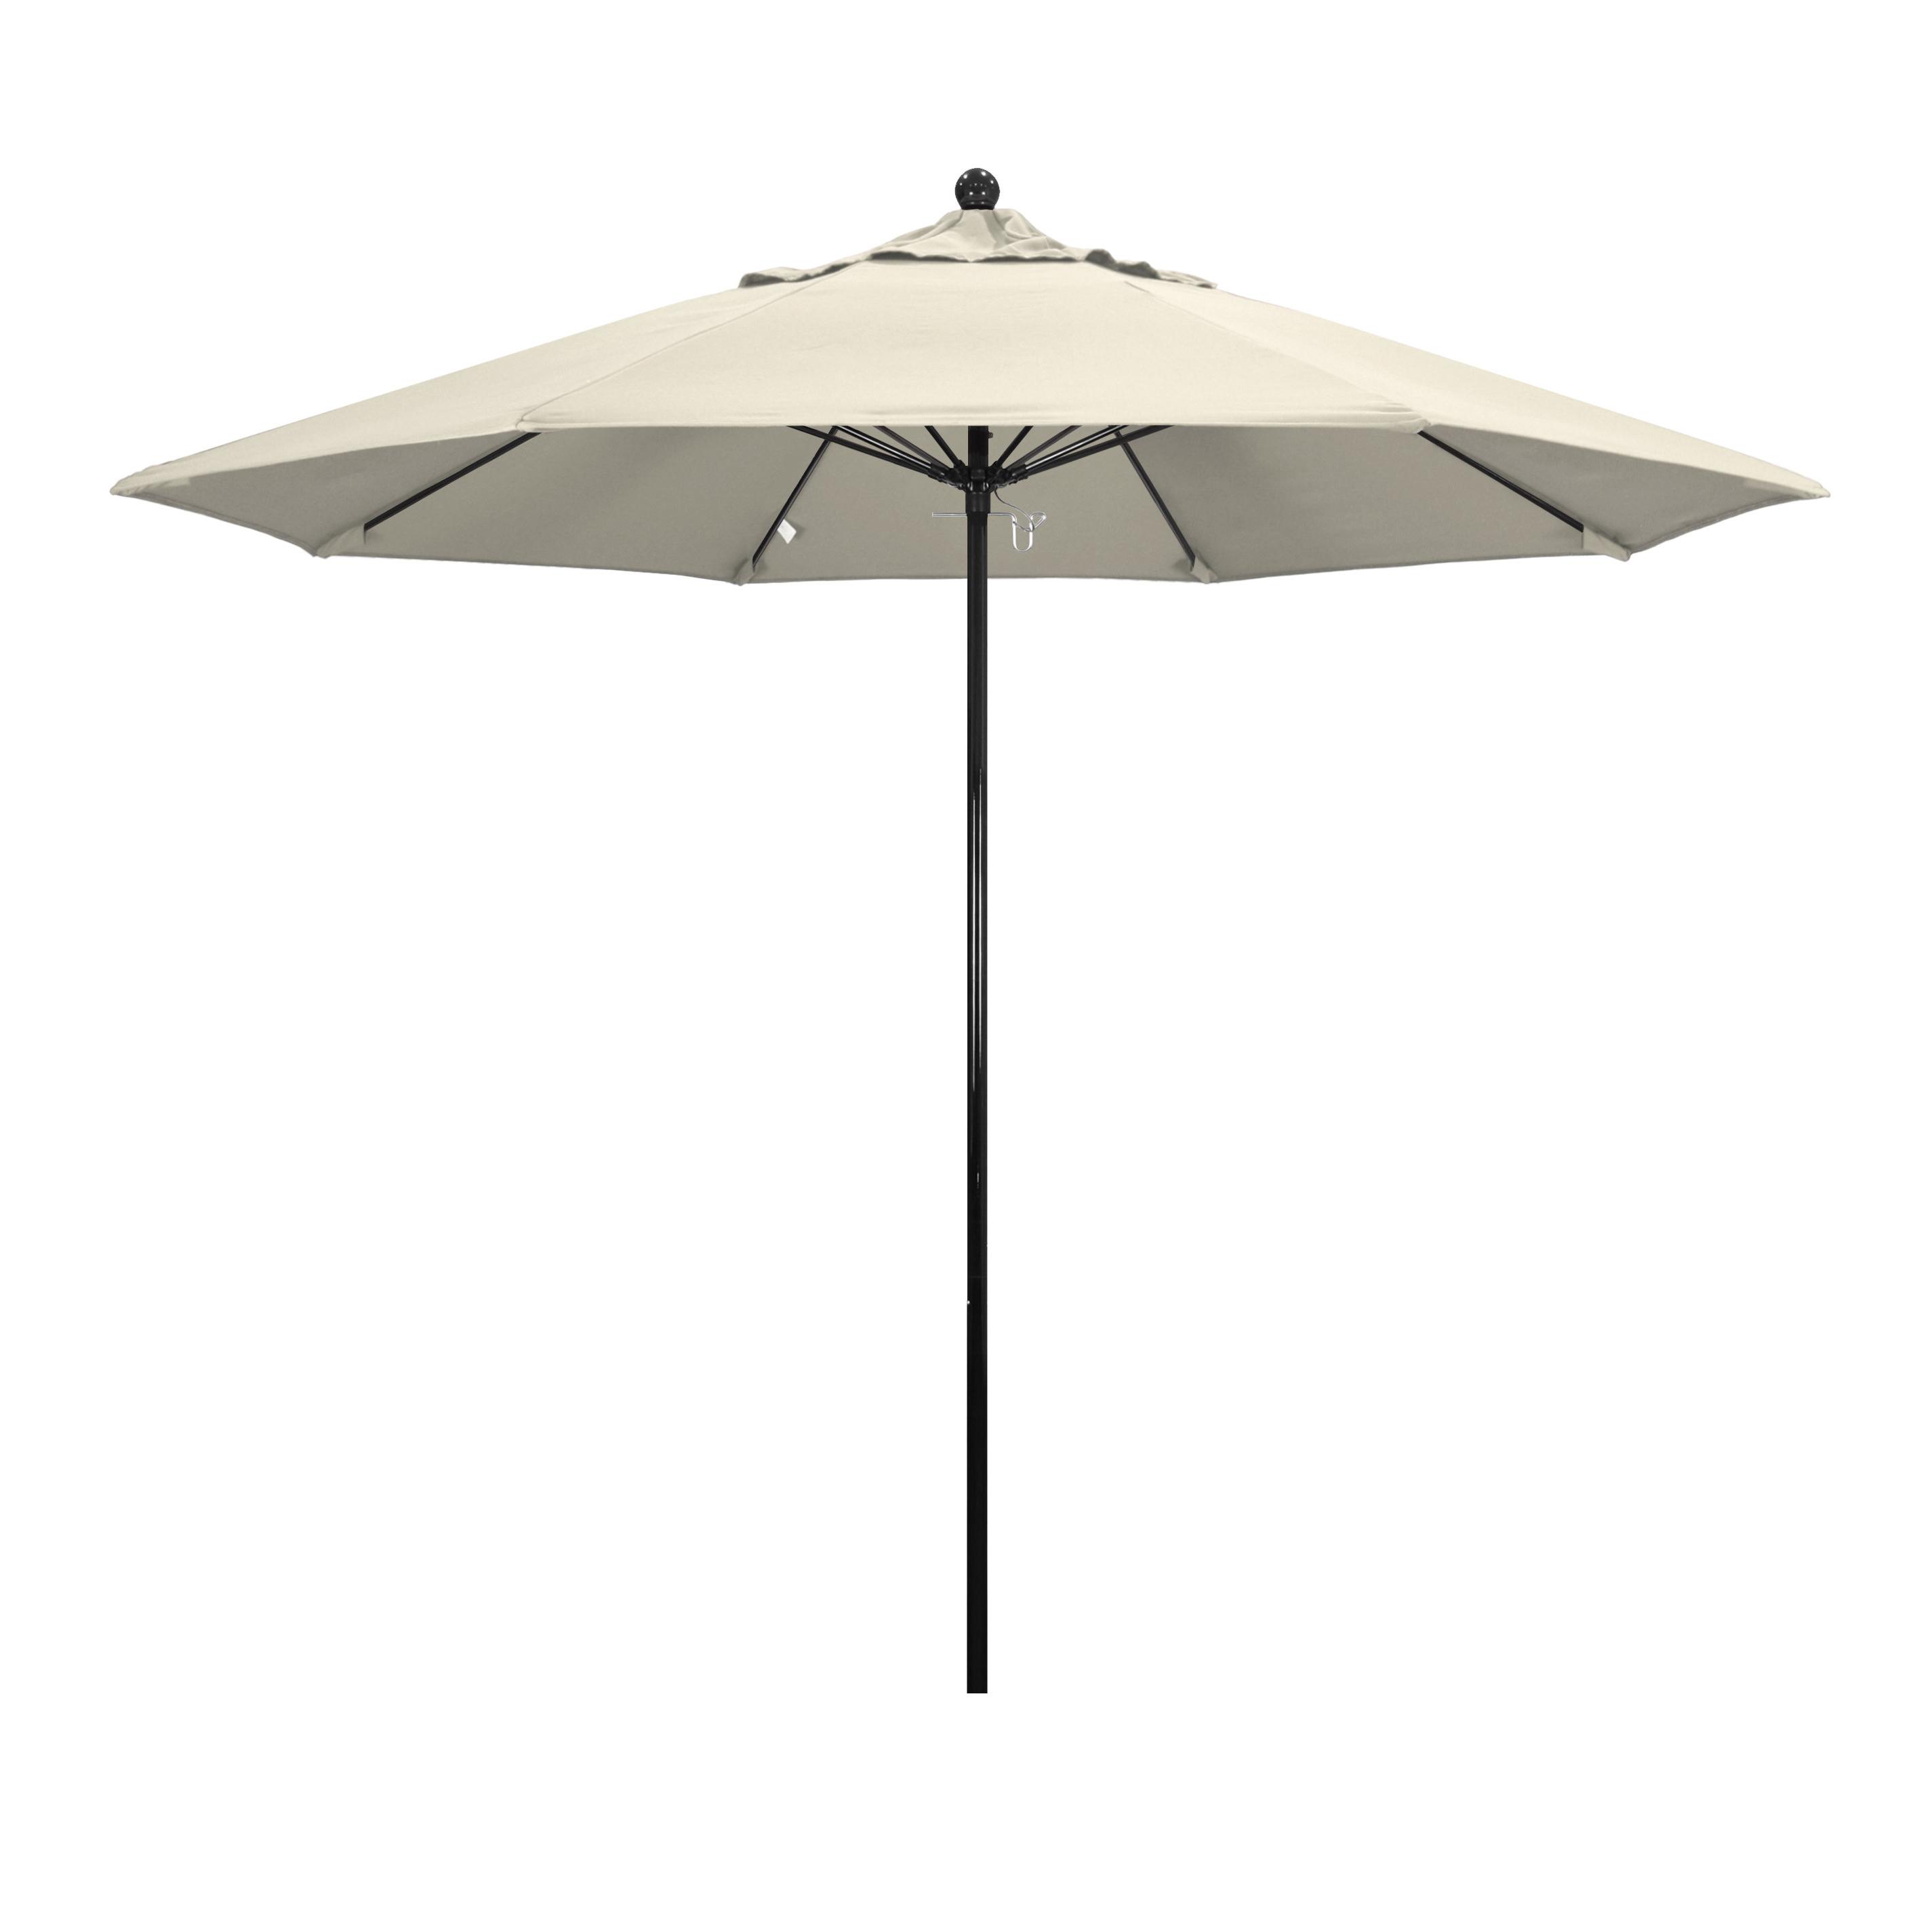 Most Popular 9' Market Umbrella Pertaining To Belles Market Umbrellas (View 8 of 20)